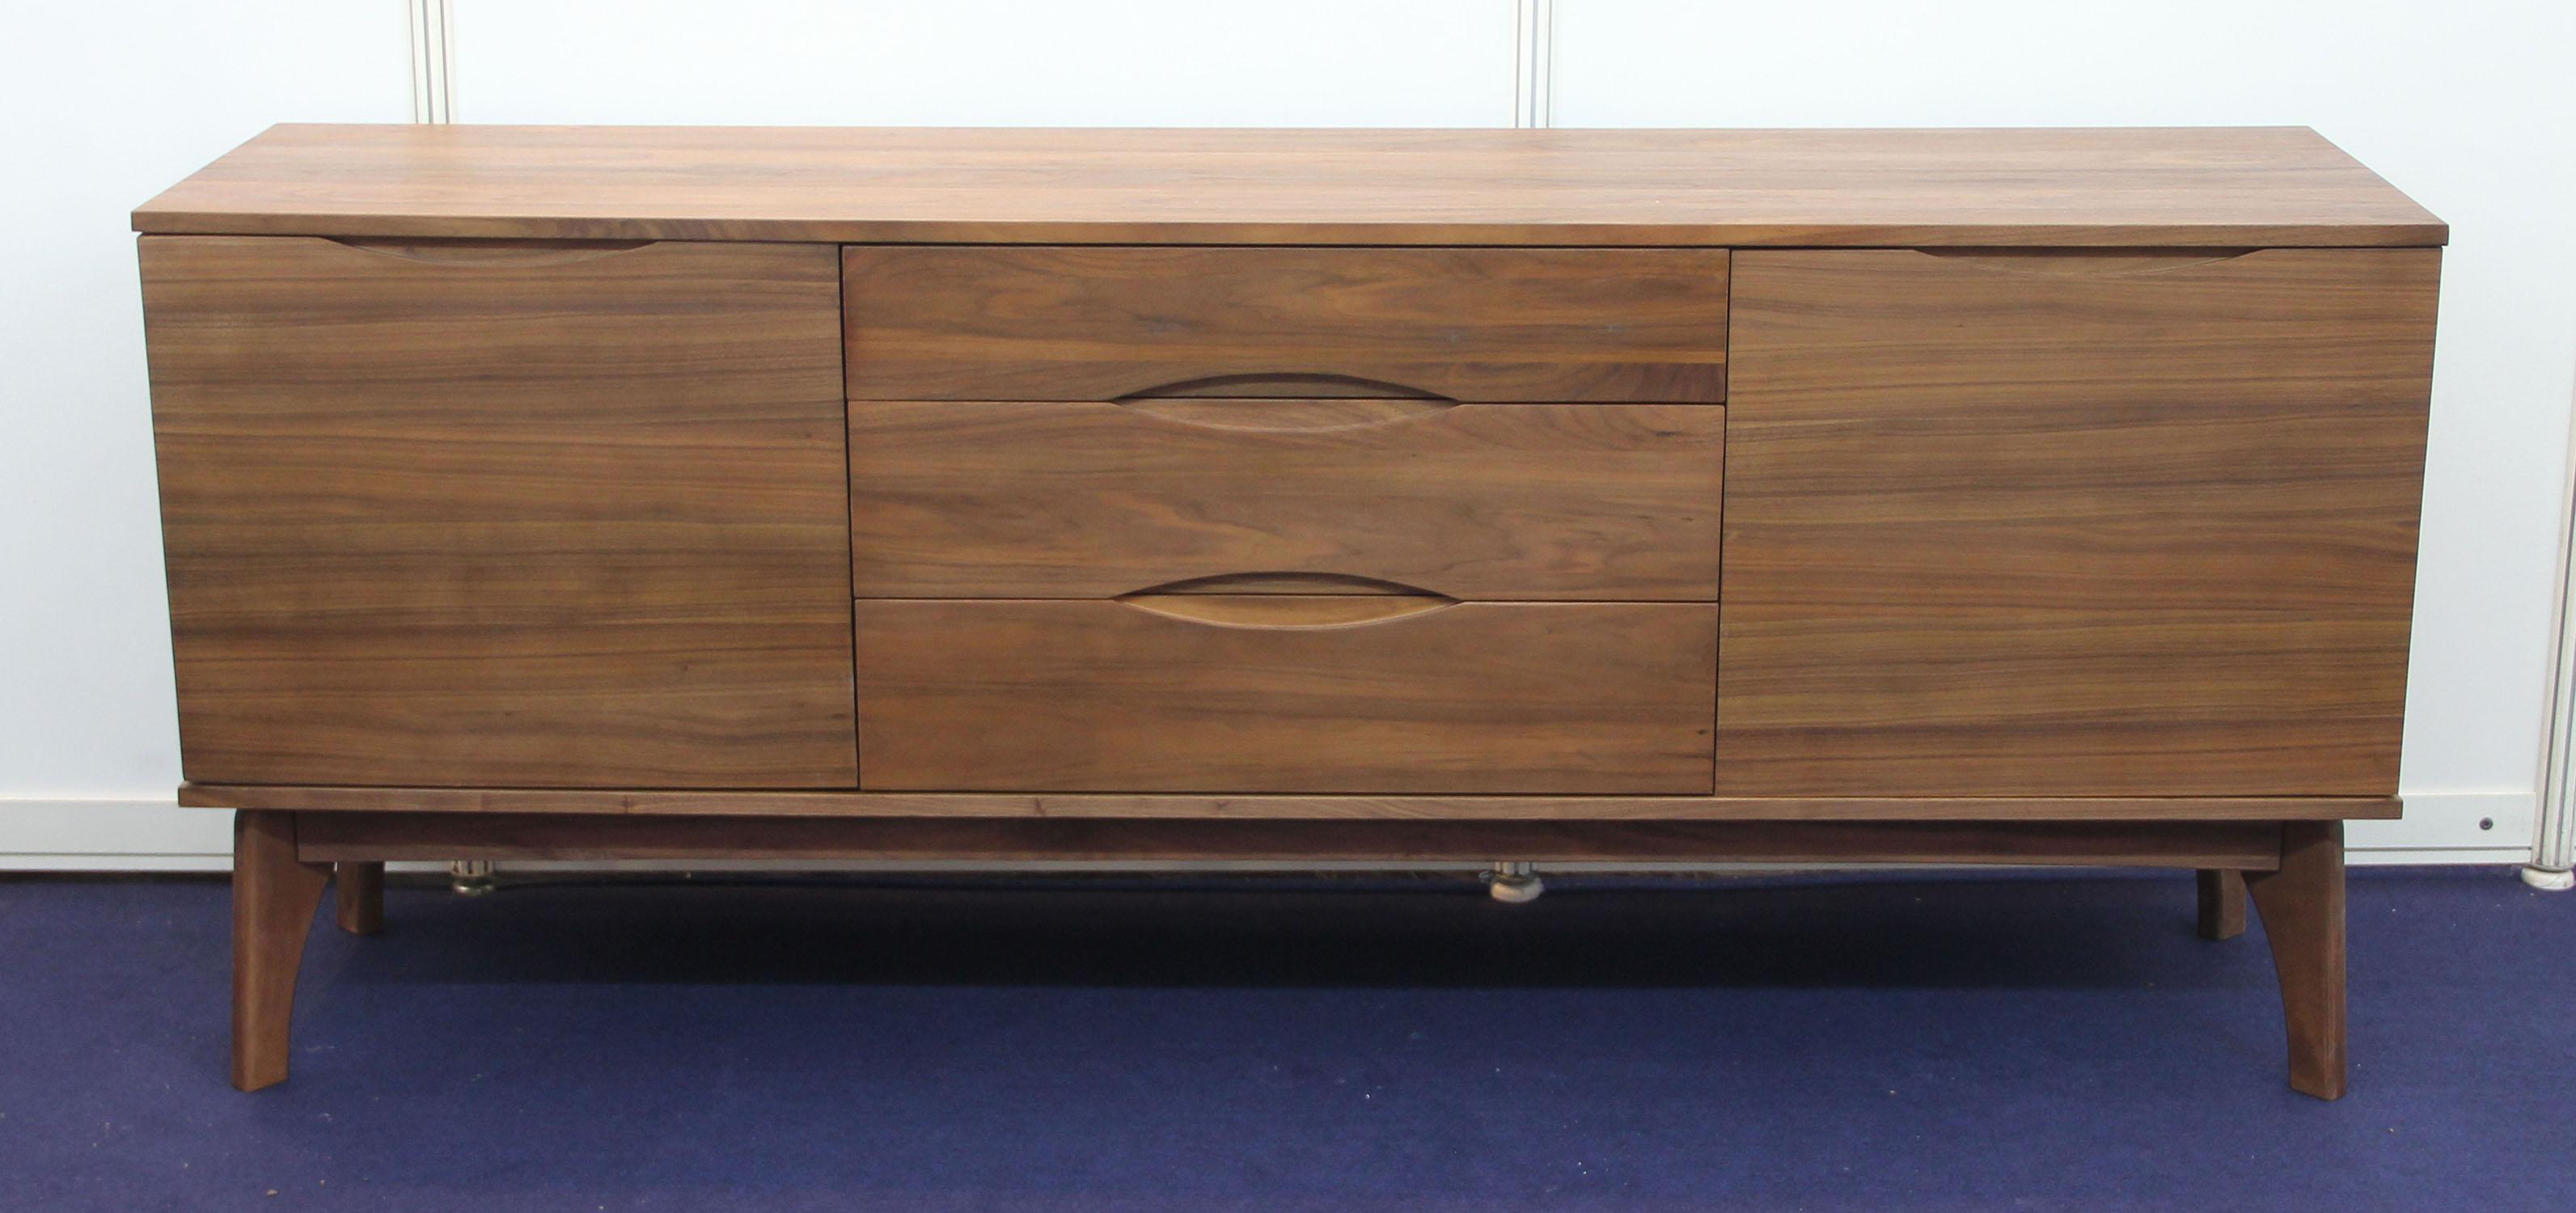 Fargo sideboard fannwood vietnam oak furniture oak for Vietnam furniture